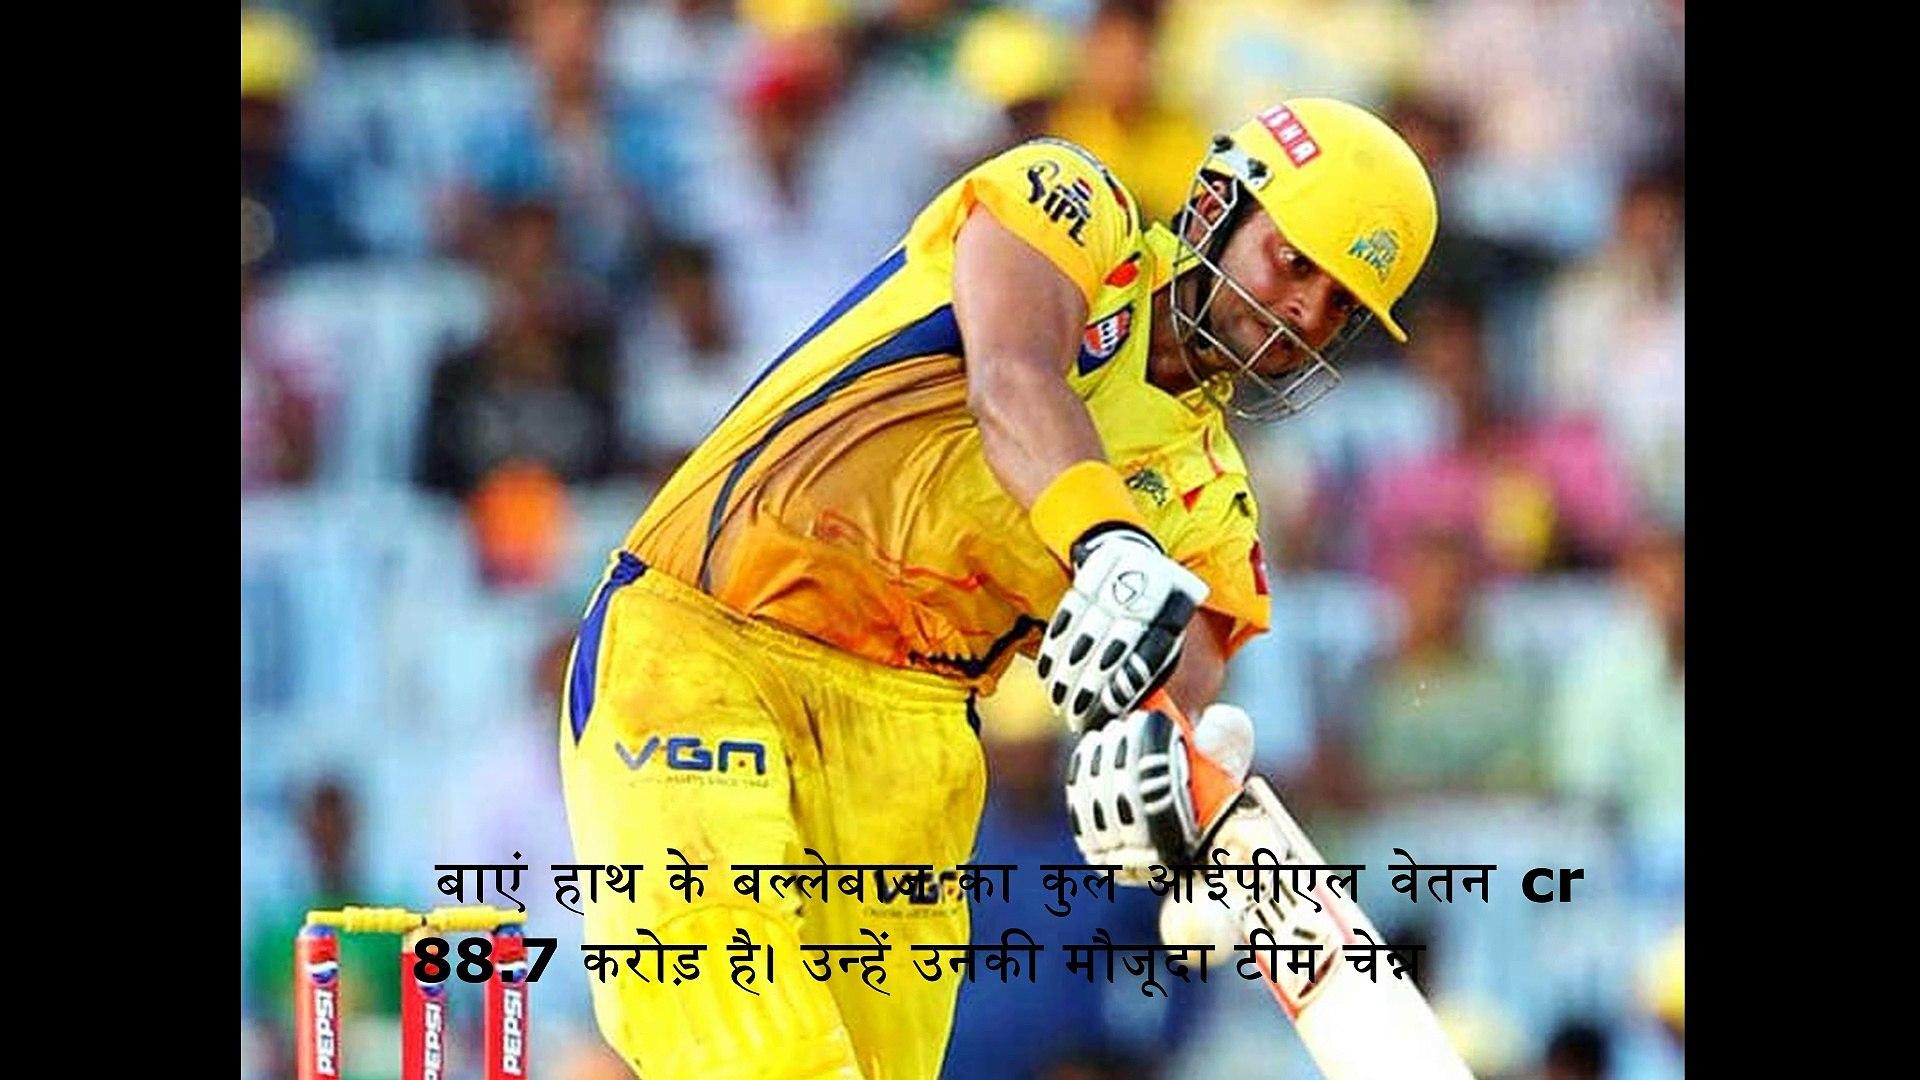 Top 5 Highest Paid Players Of IPL   IPL 2020   Latest Cricket Updates 2020   rohit sharma   ms dhoni